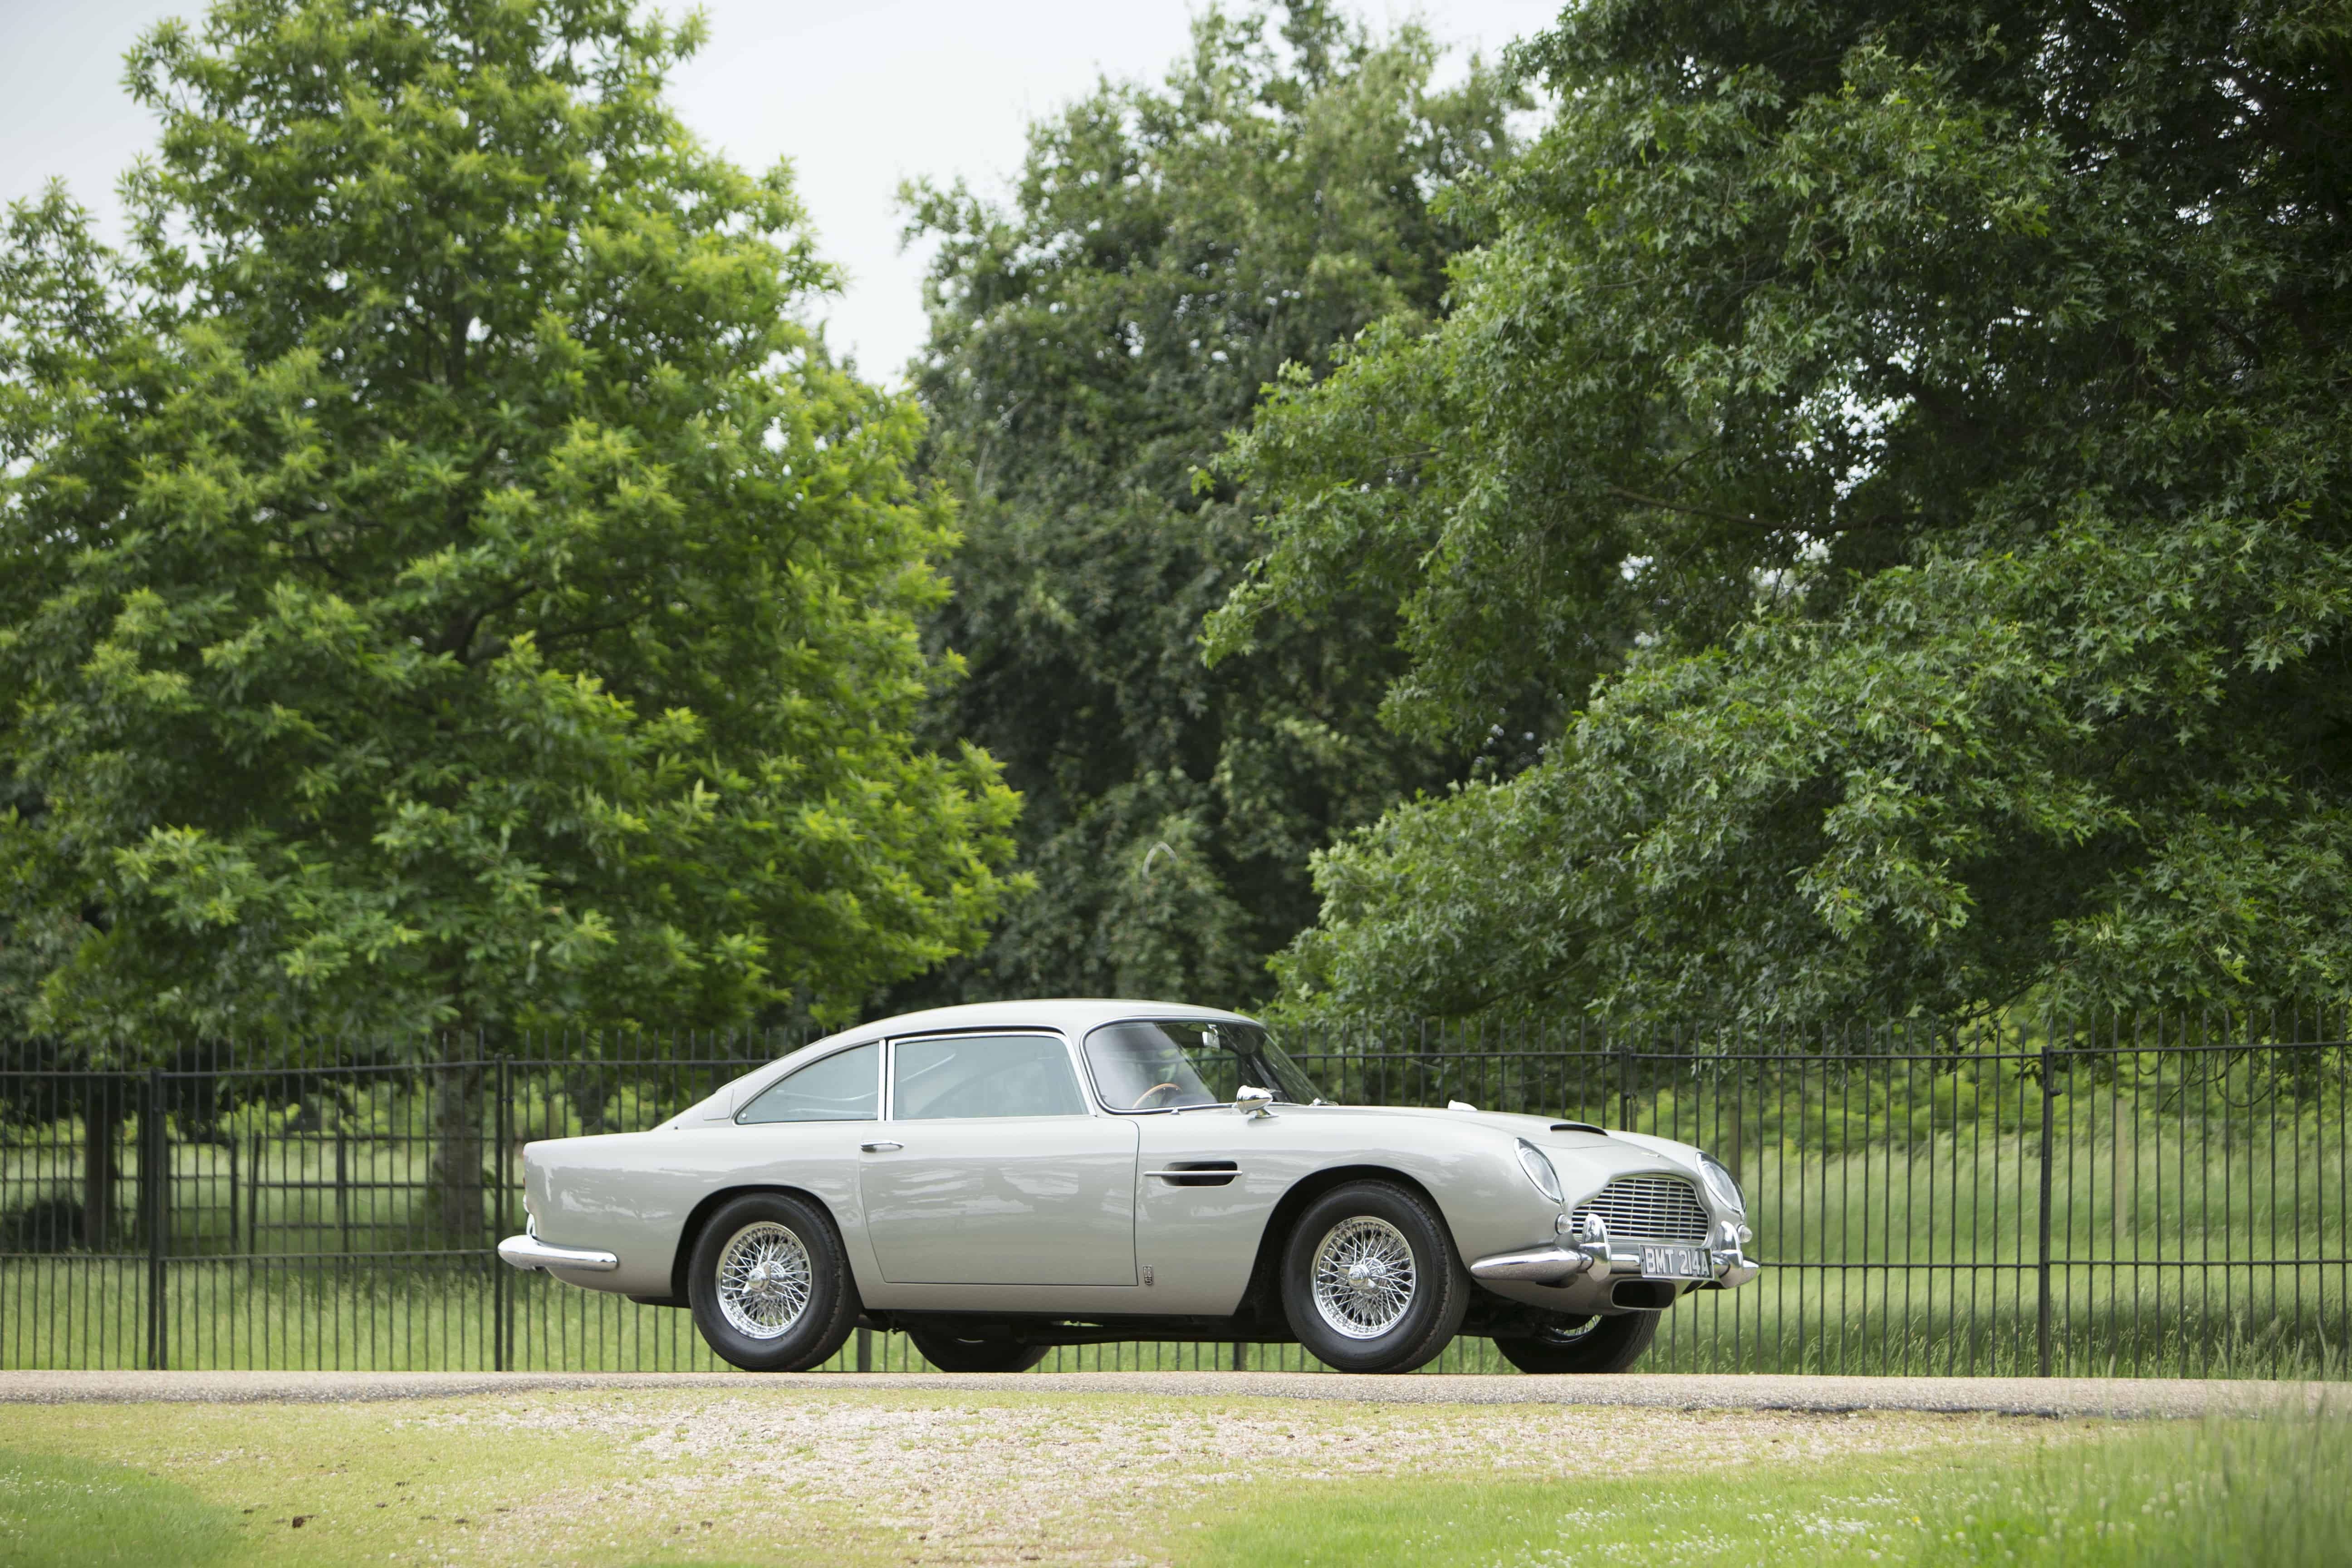 1965 Aston Martin DB5, ex GoldenEye, auctioned by Bonhams in July 2018 for £ 1,961,500. Photo Bonhams